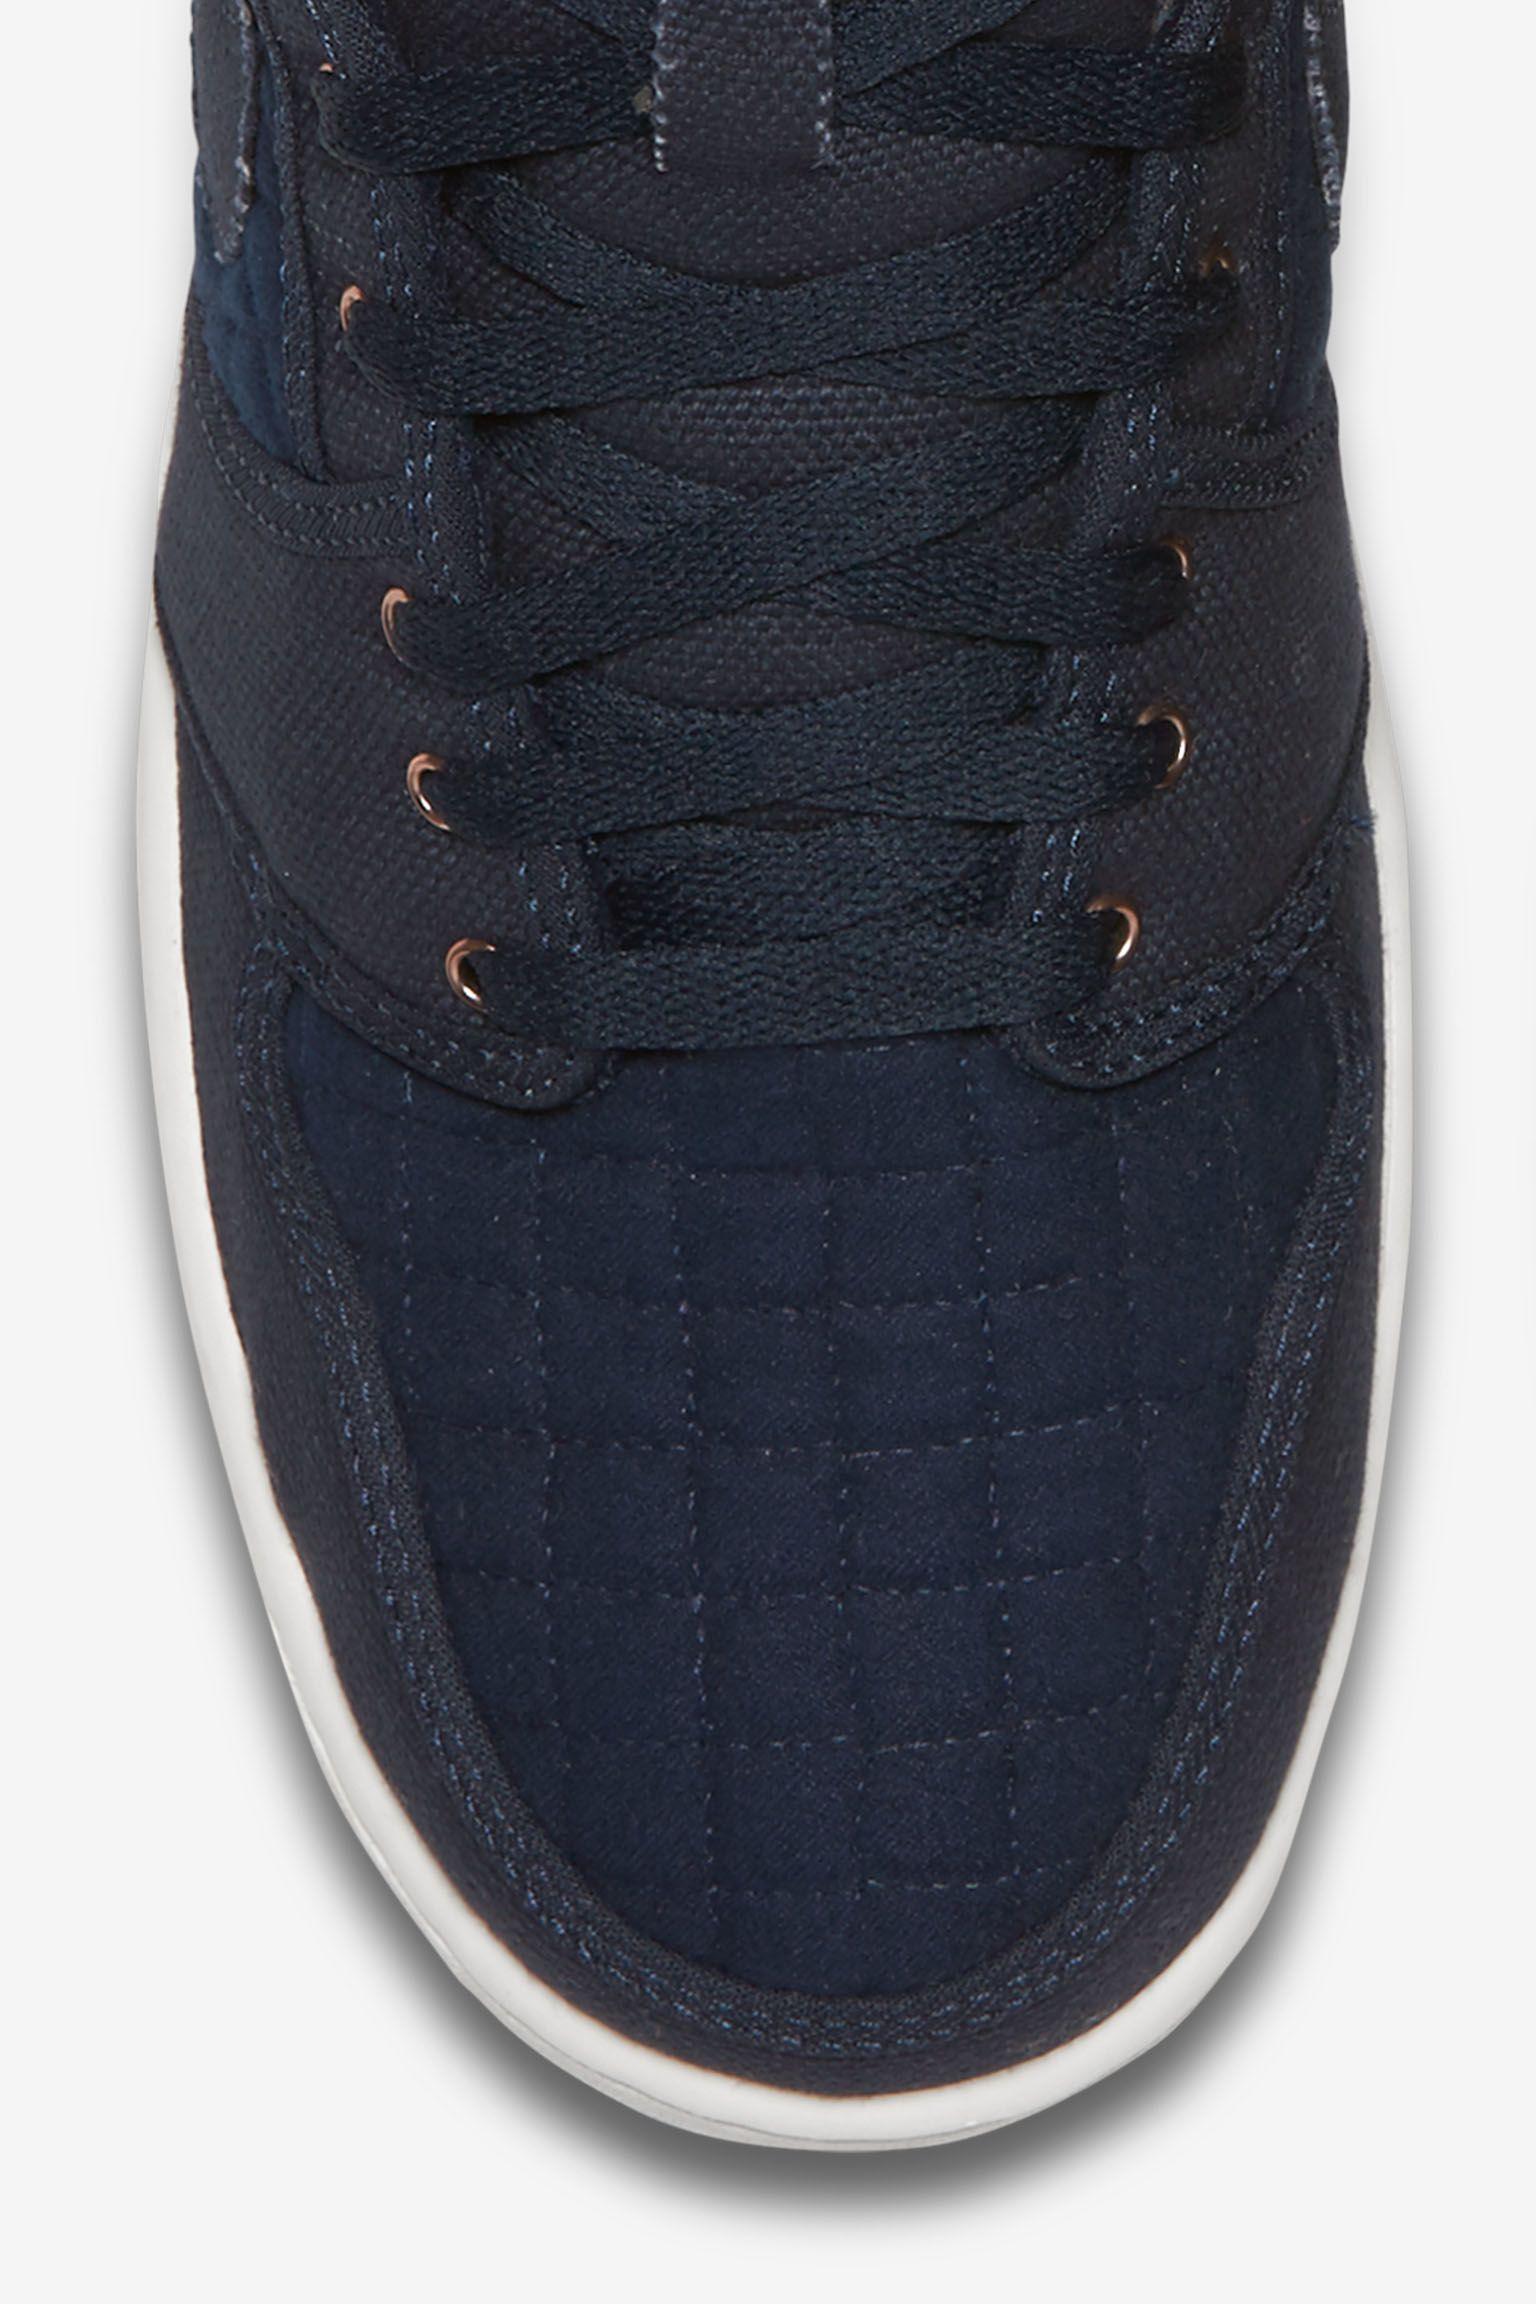 Air Jordan 1 Retro KO 'Blue Quilted' Release Date